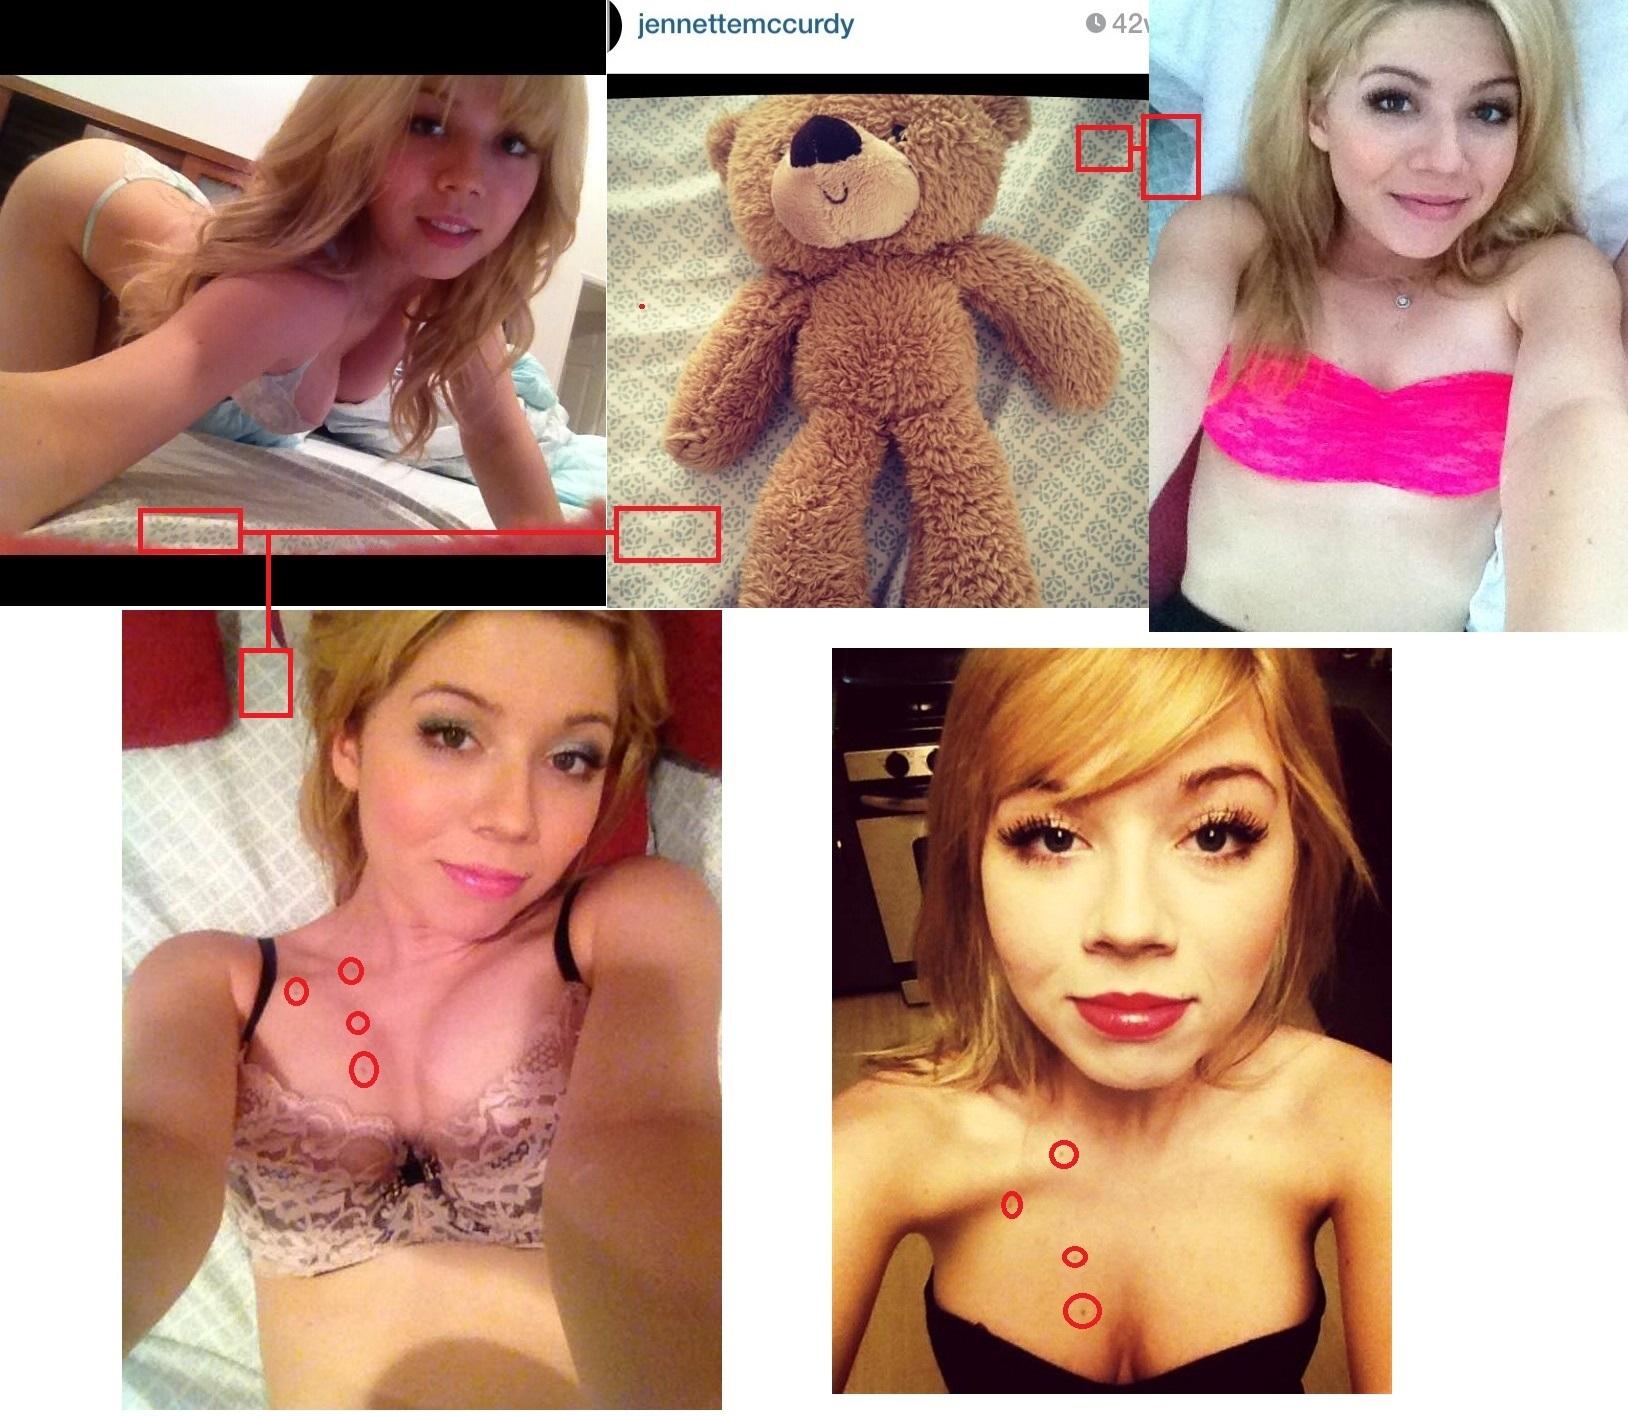 Naked jenette mccurdy Jennette Mccurdy